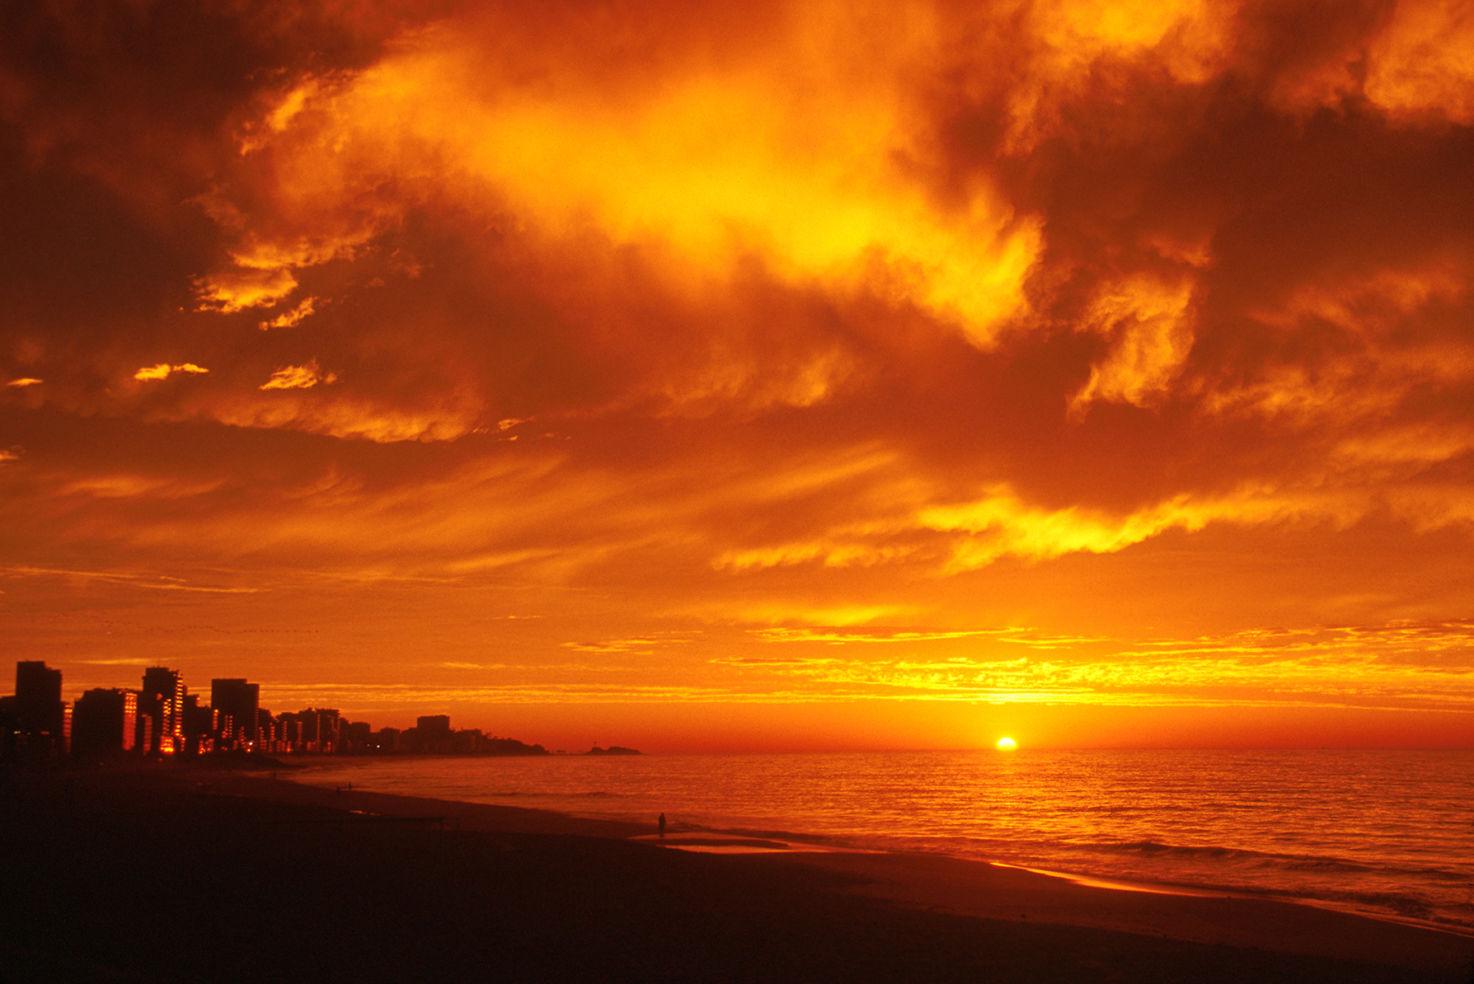 Sunrise on Ipanema Beach in Rio de Janeiro, Brazil